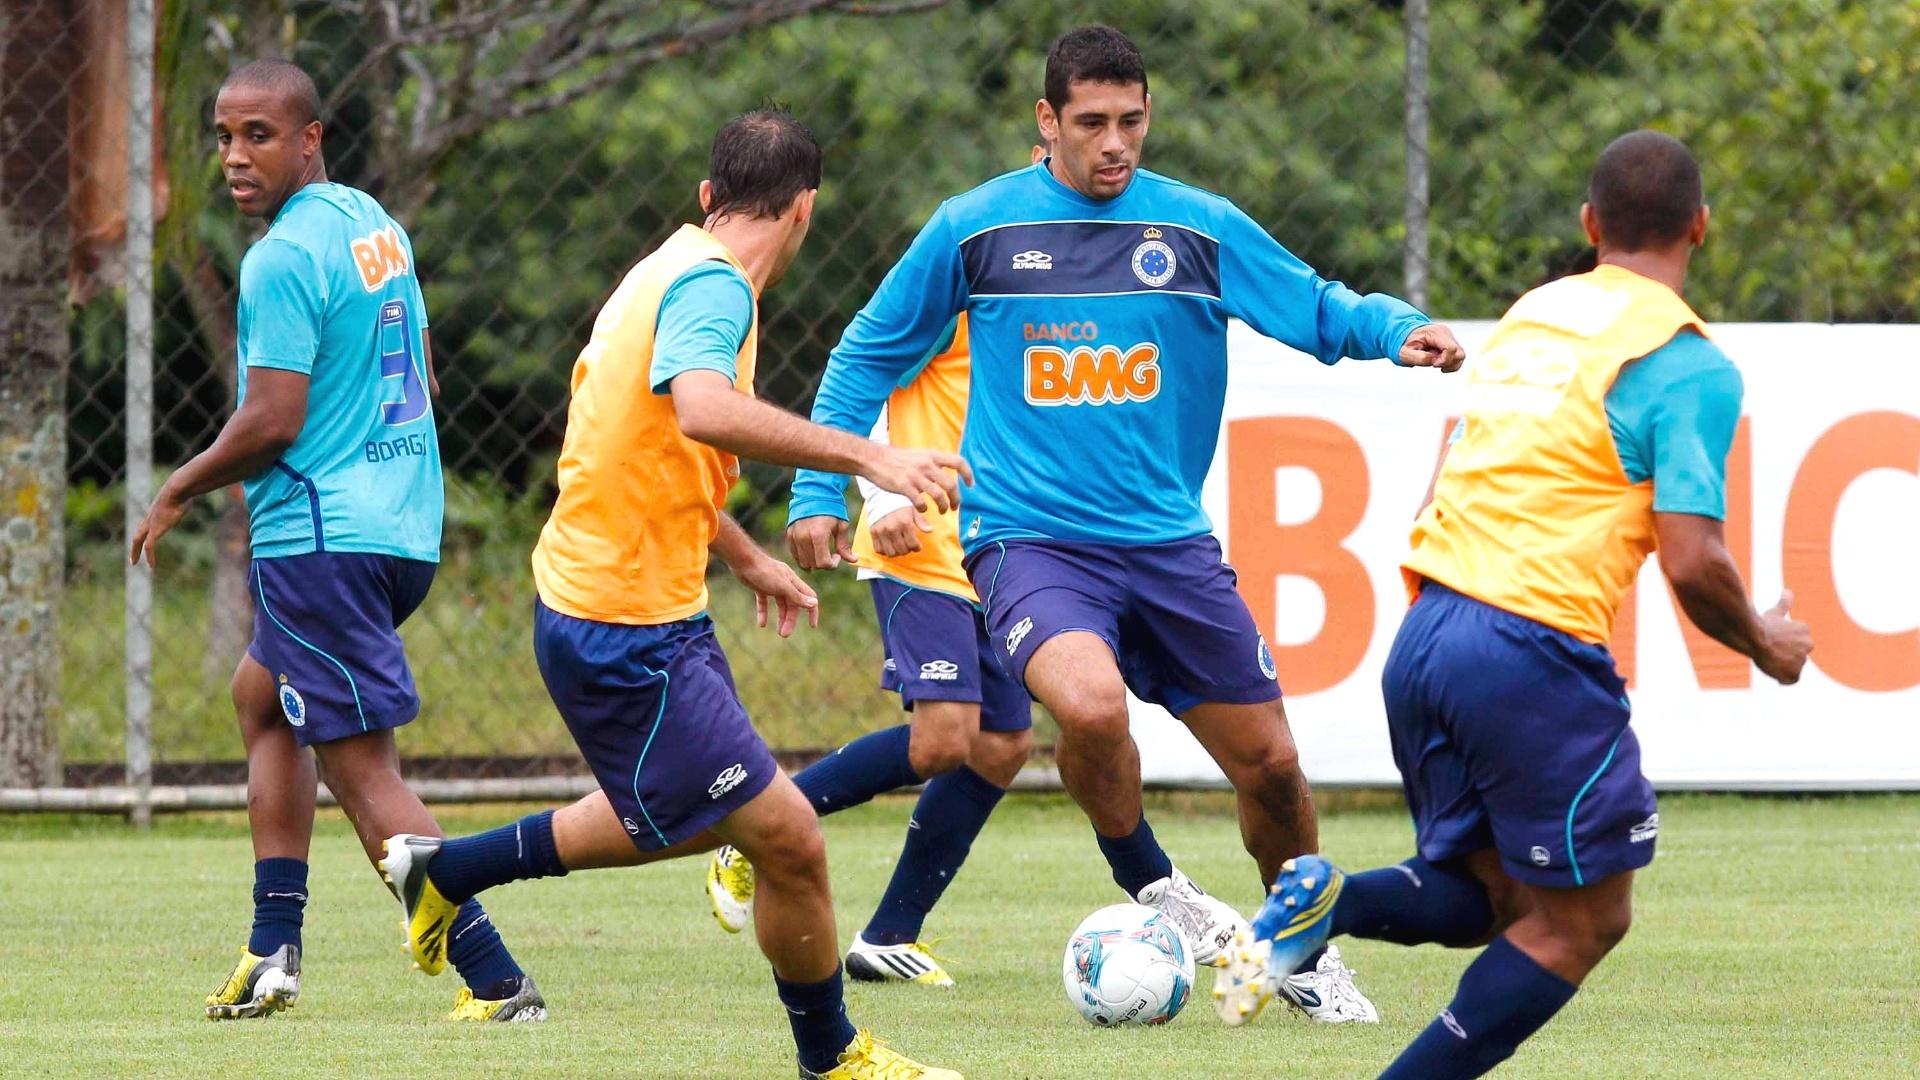 Meia Diego Souza, do Cruzeiro, participa de treino na Toca da Raposa II (5/4/2013)